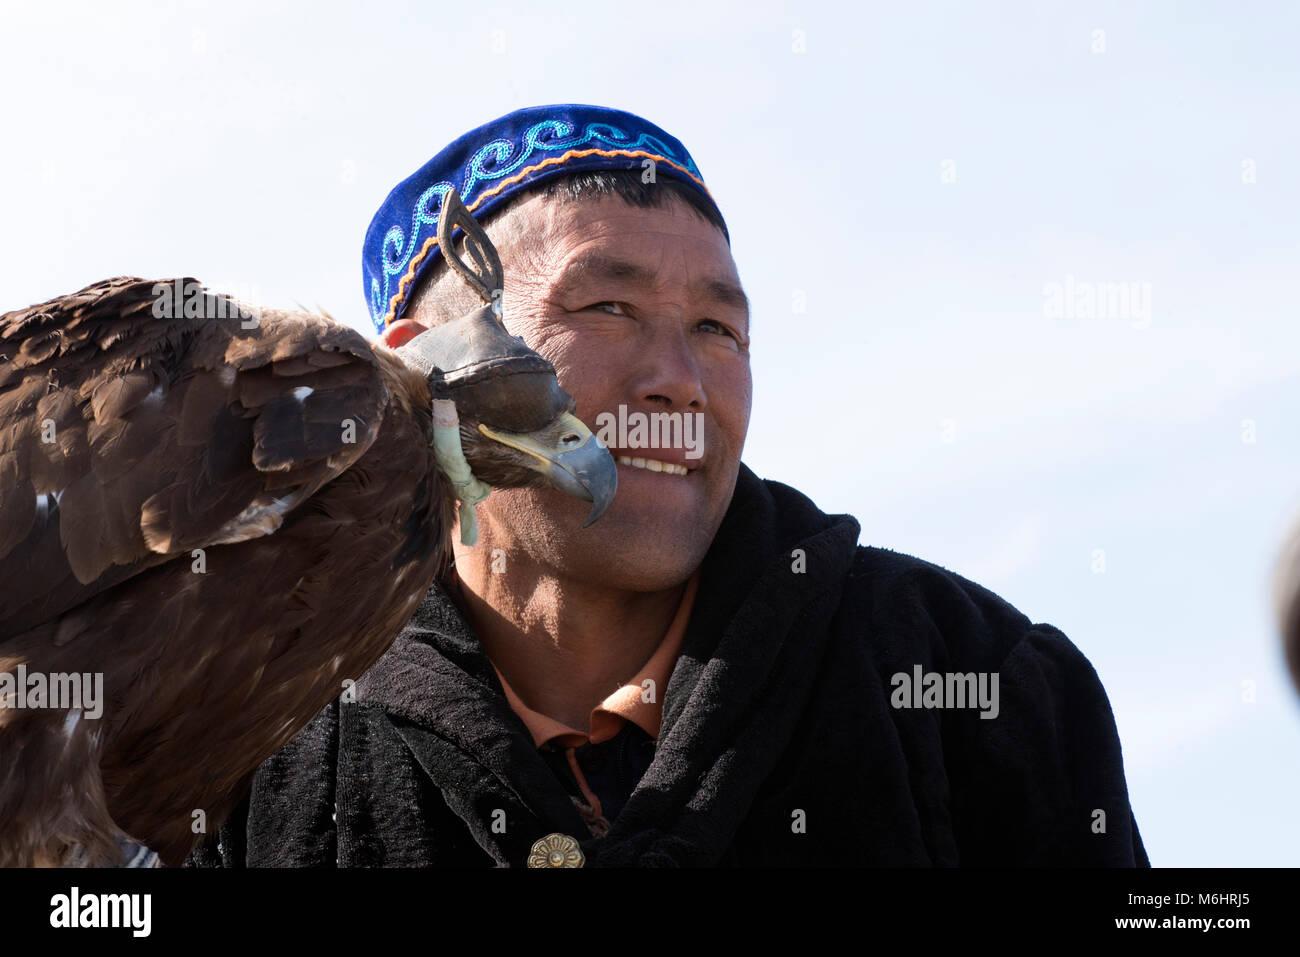 A Kazakh eagle hunter with his golden eagle at the 2017 golden eagle festival, Olgii, western Mongolia. - Stock Image